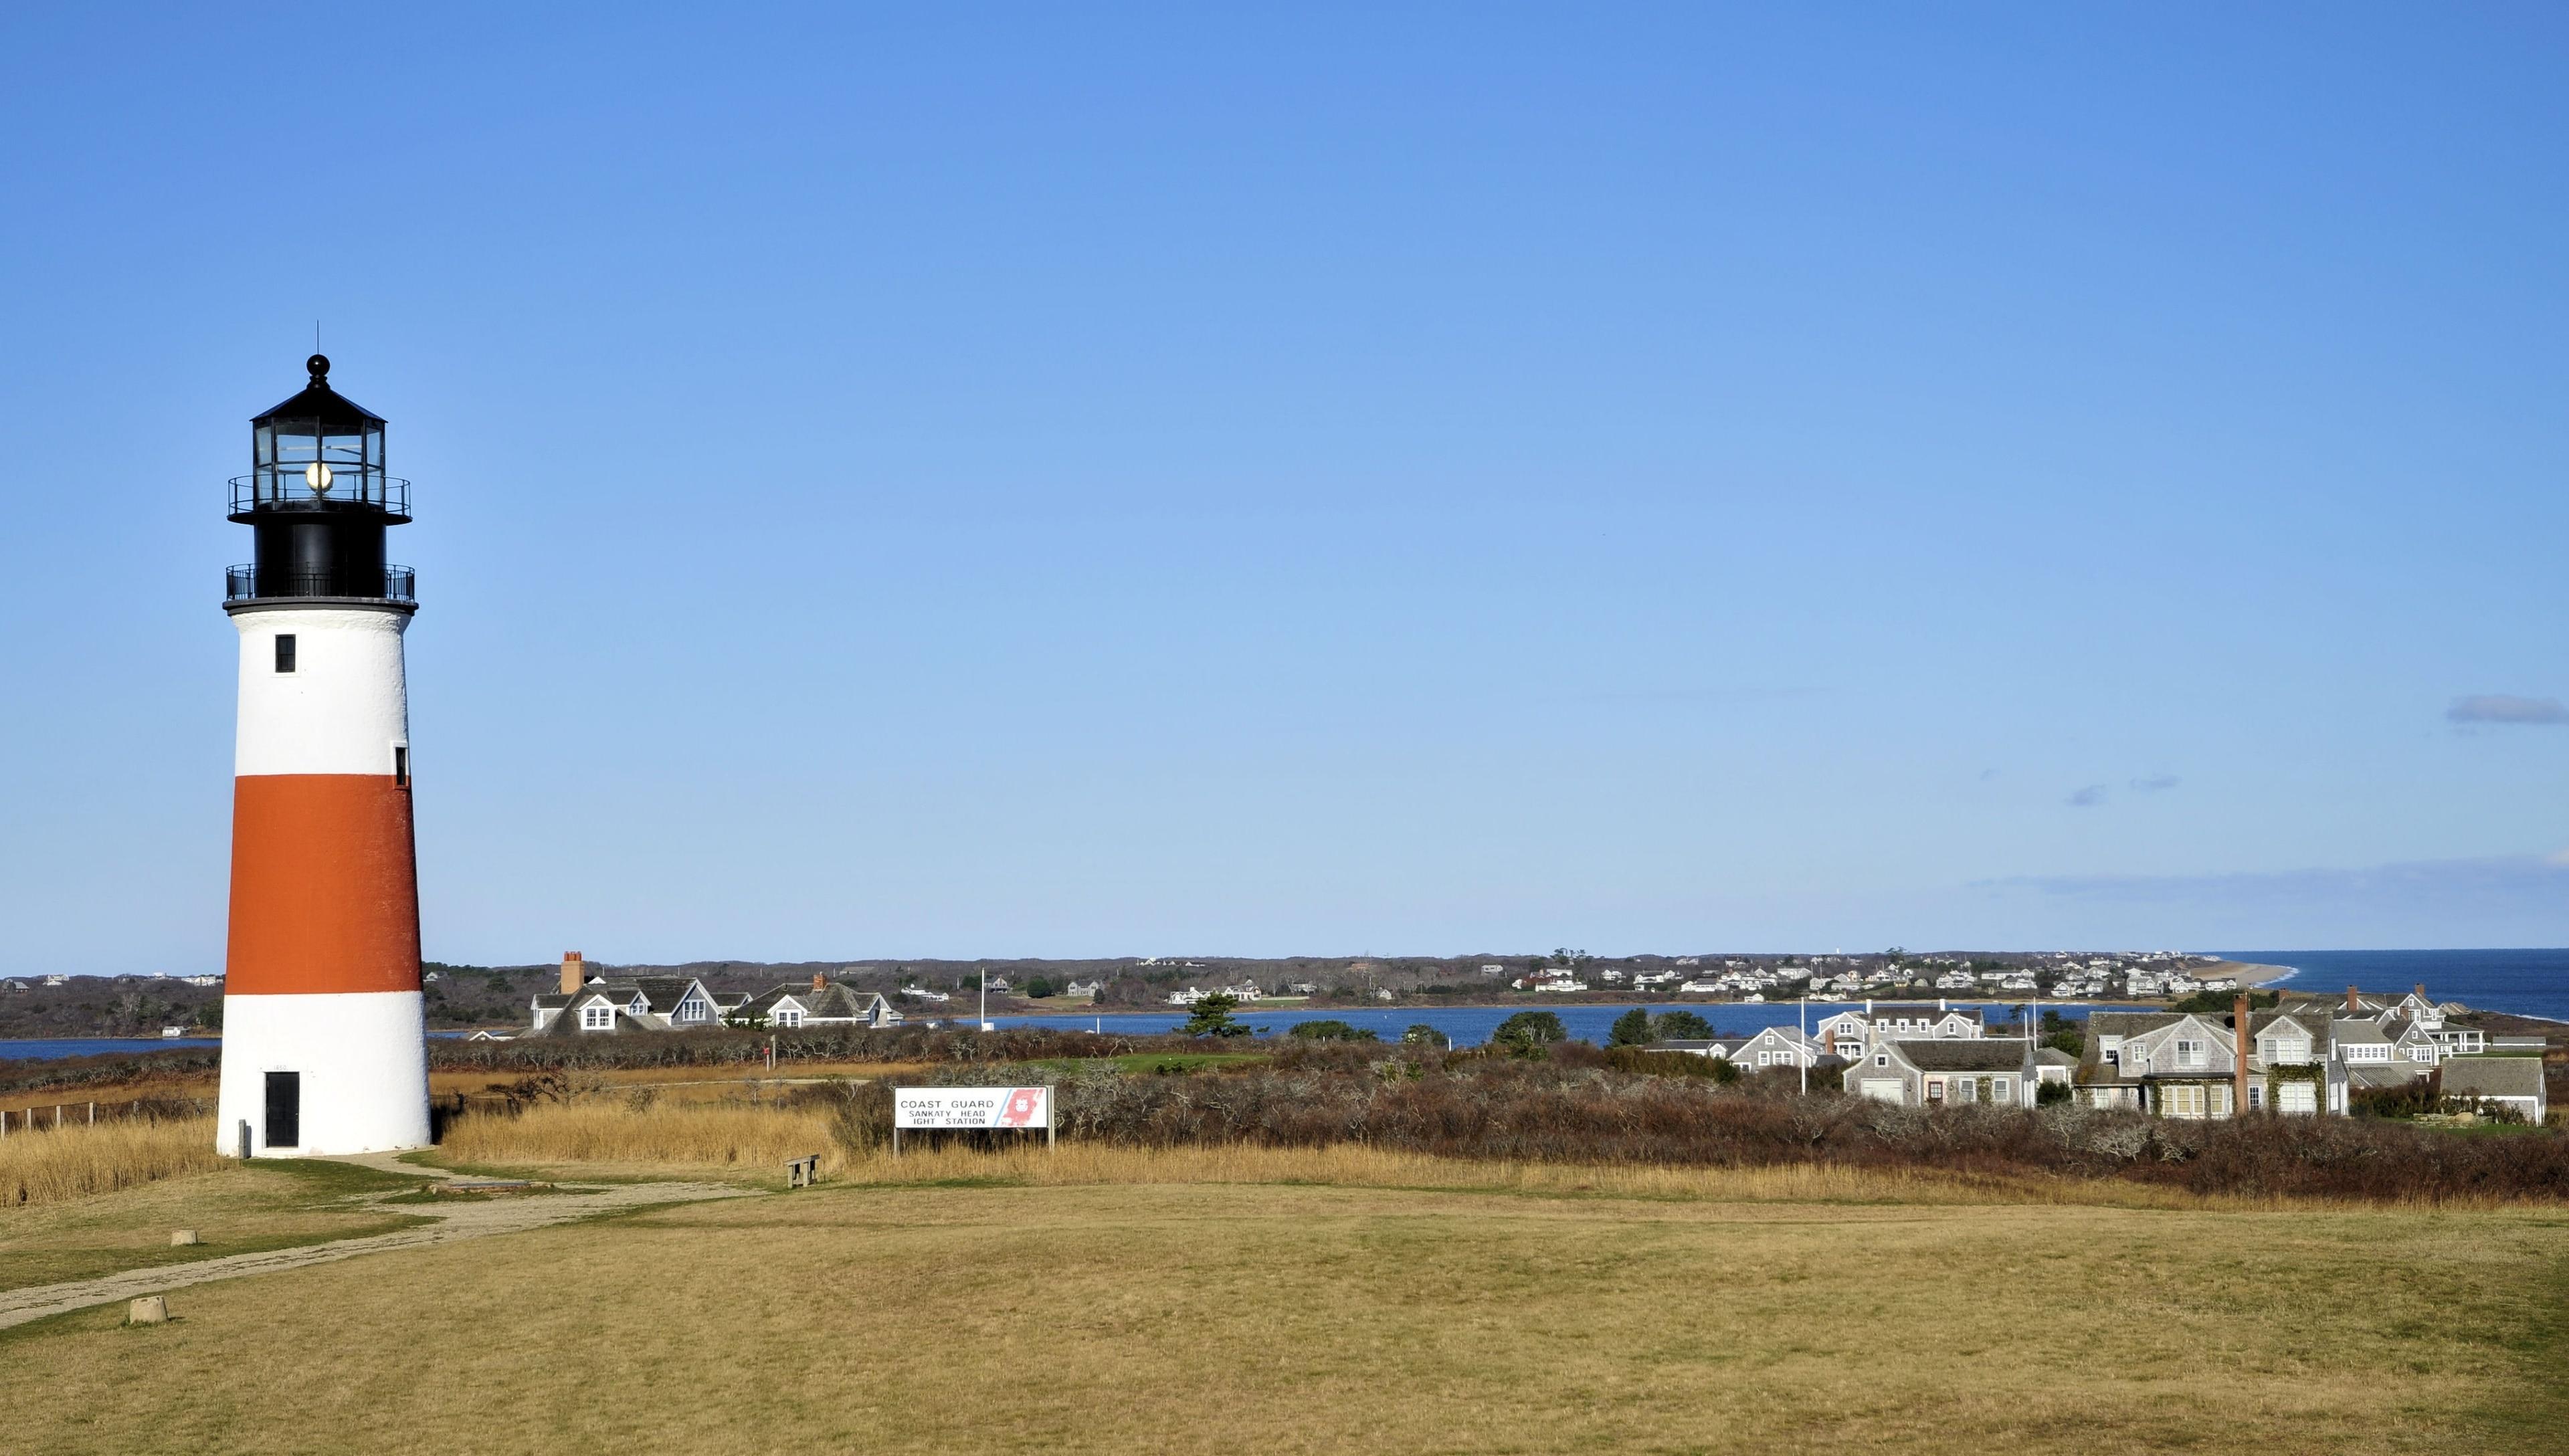 Siasconset, Massachusetts, United States of America